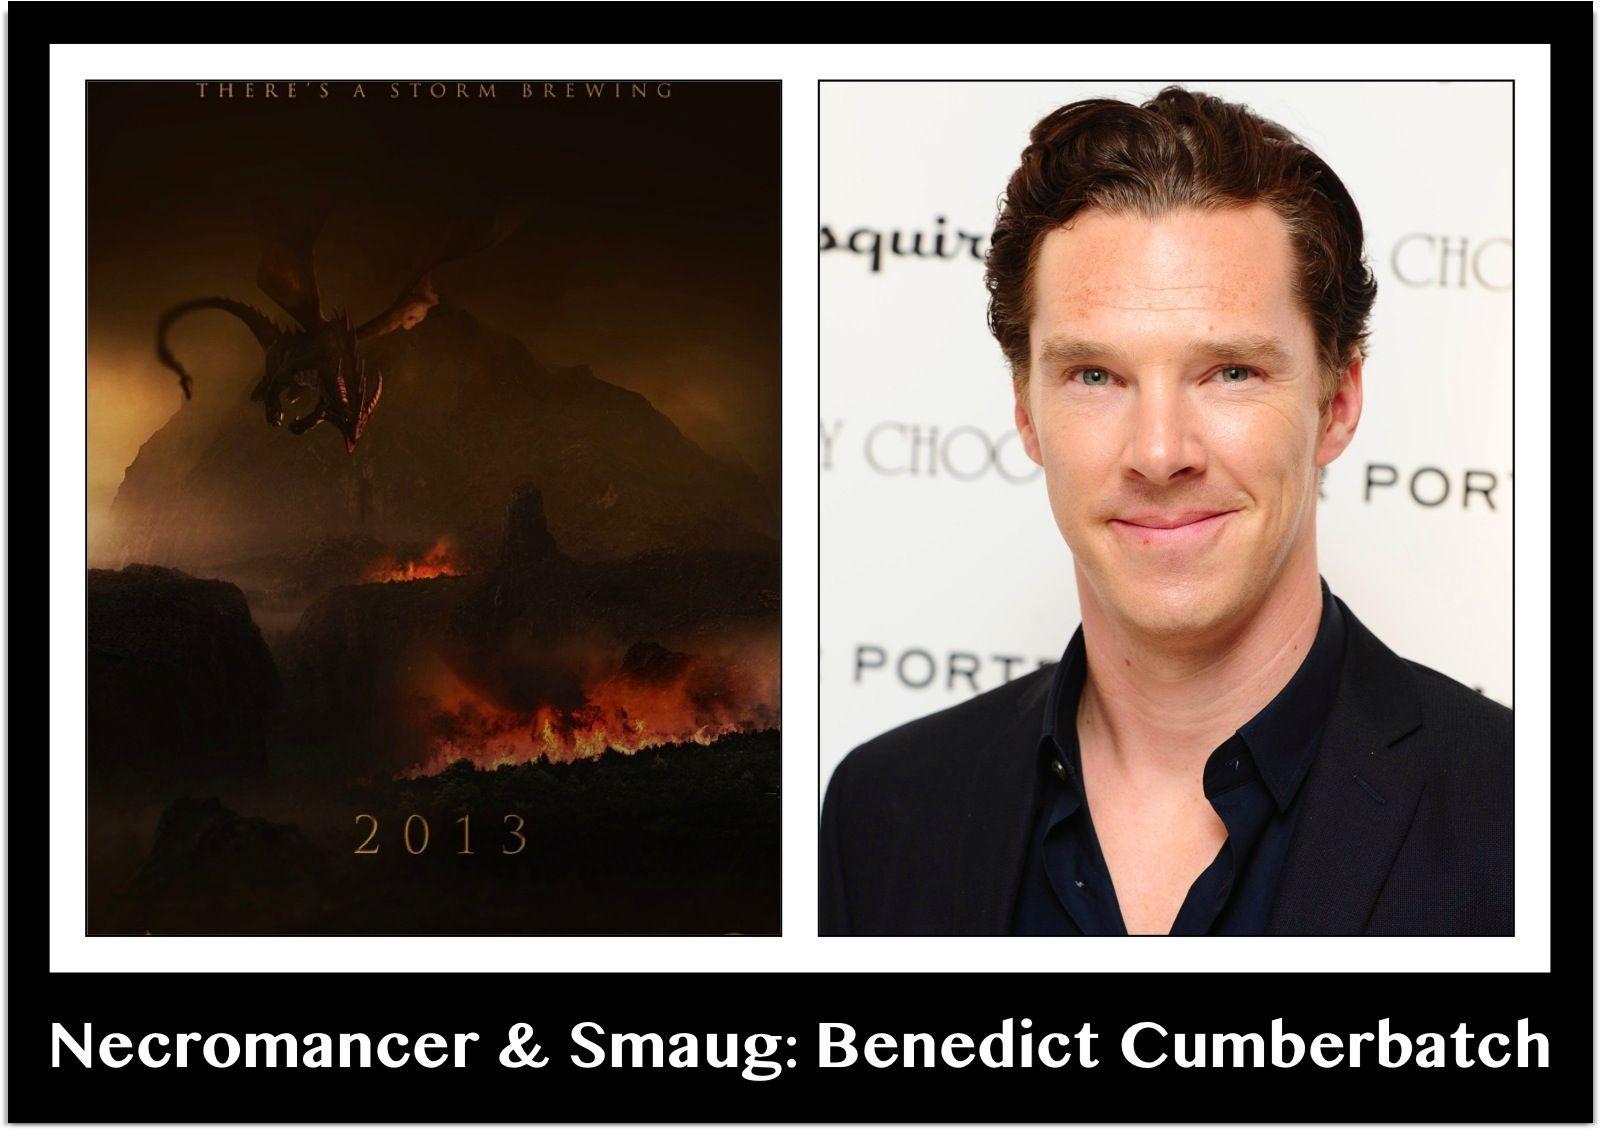 Necromancer & Smaug: Benedict Cumberbatch | The hobbit ...